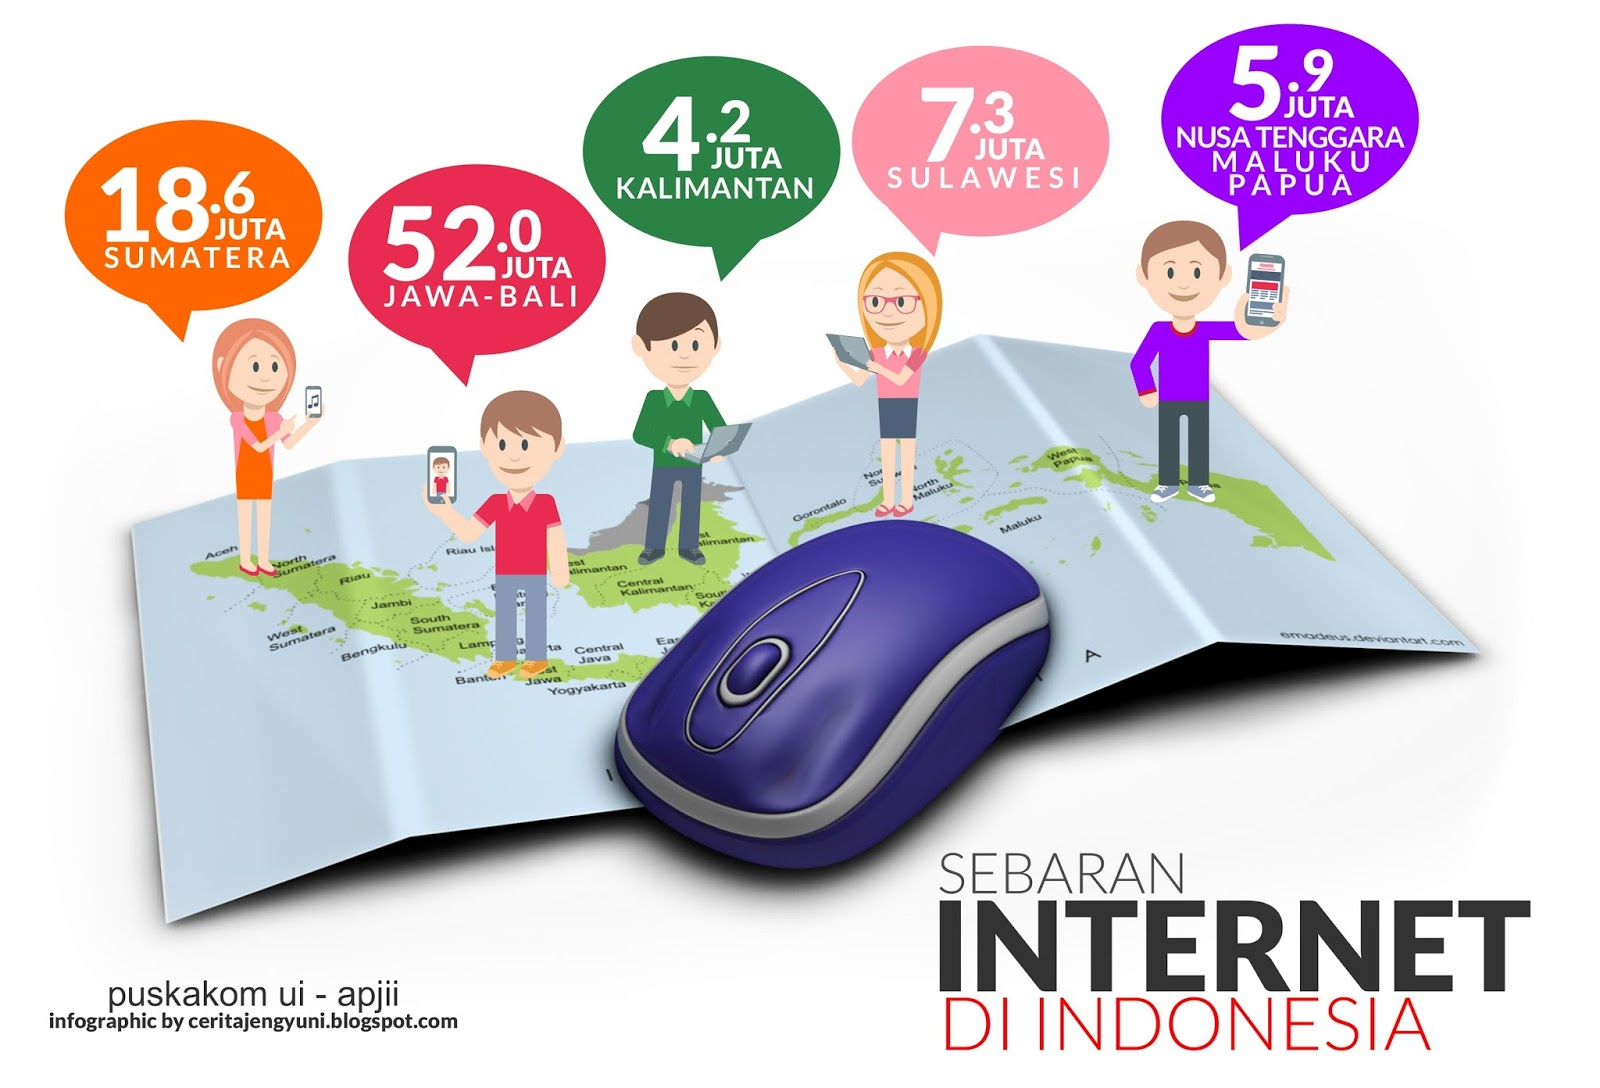 Pengguna Internet Indonesia by Propinsi